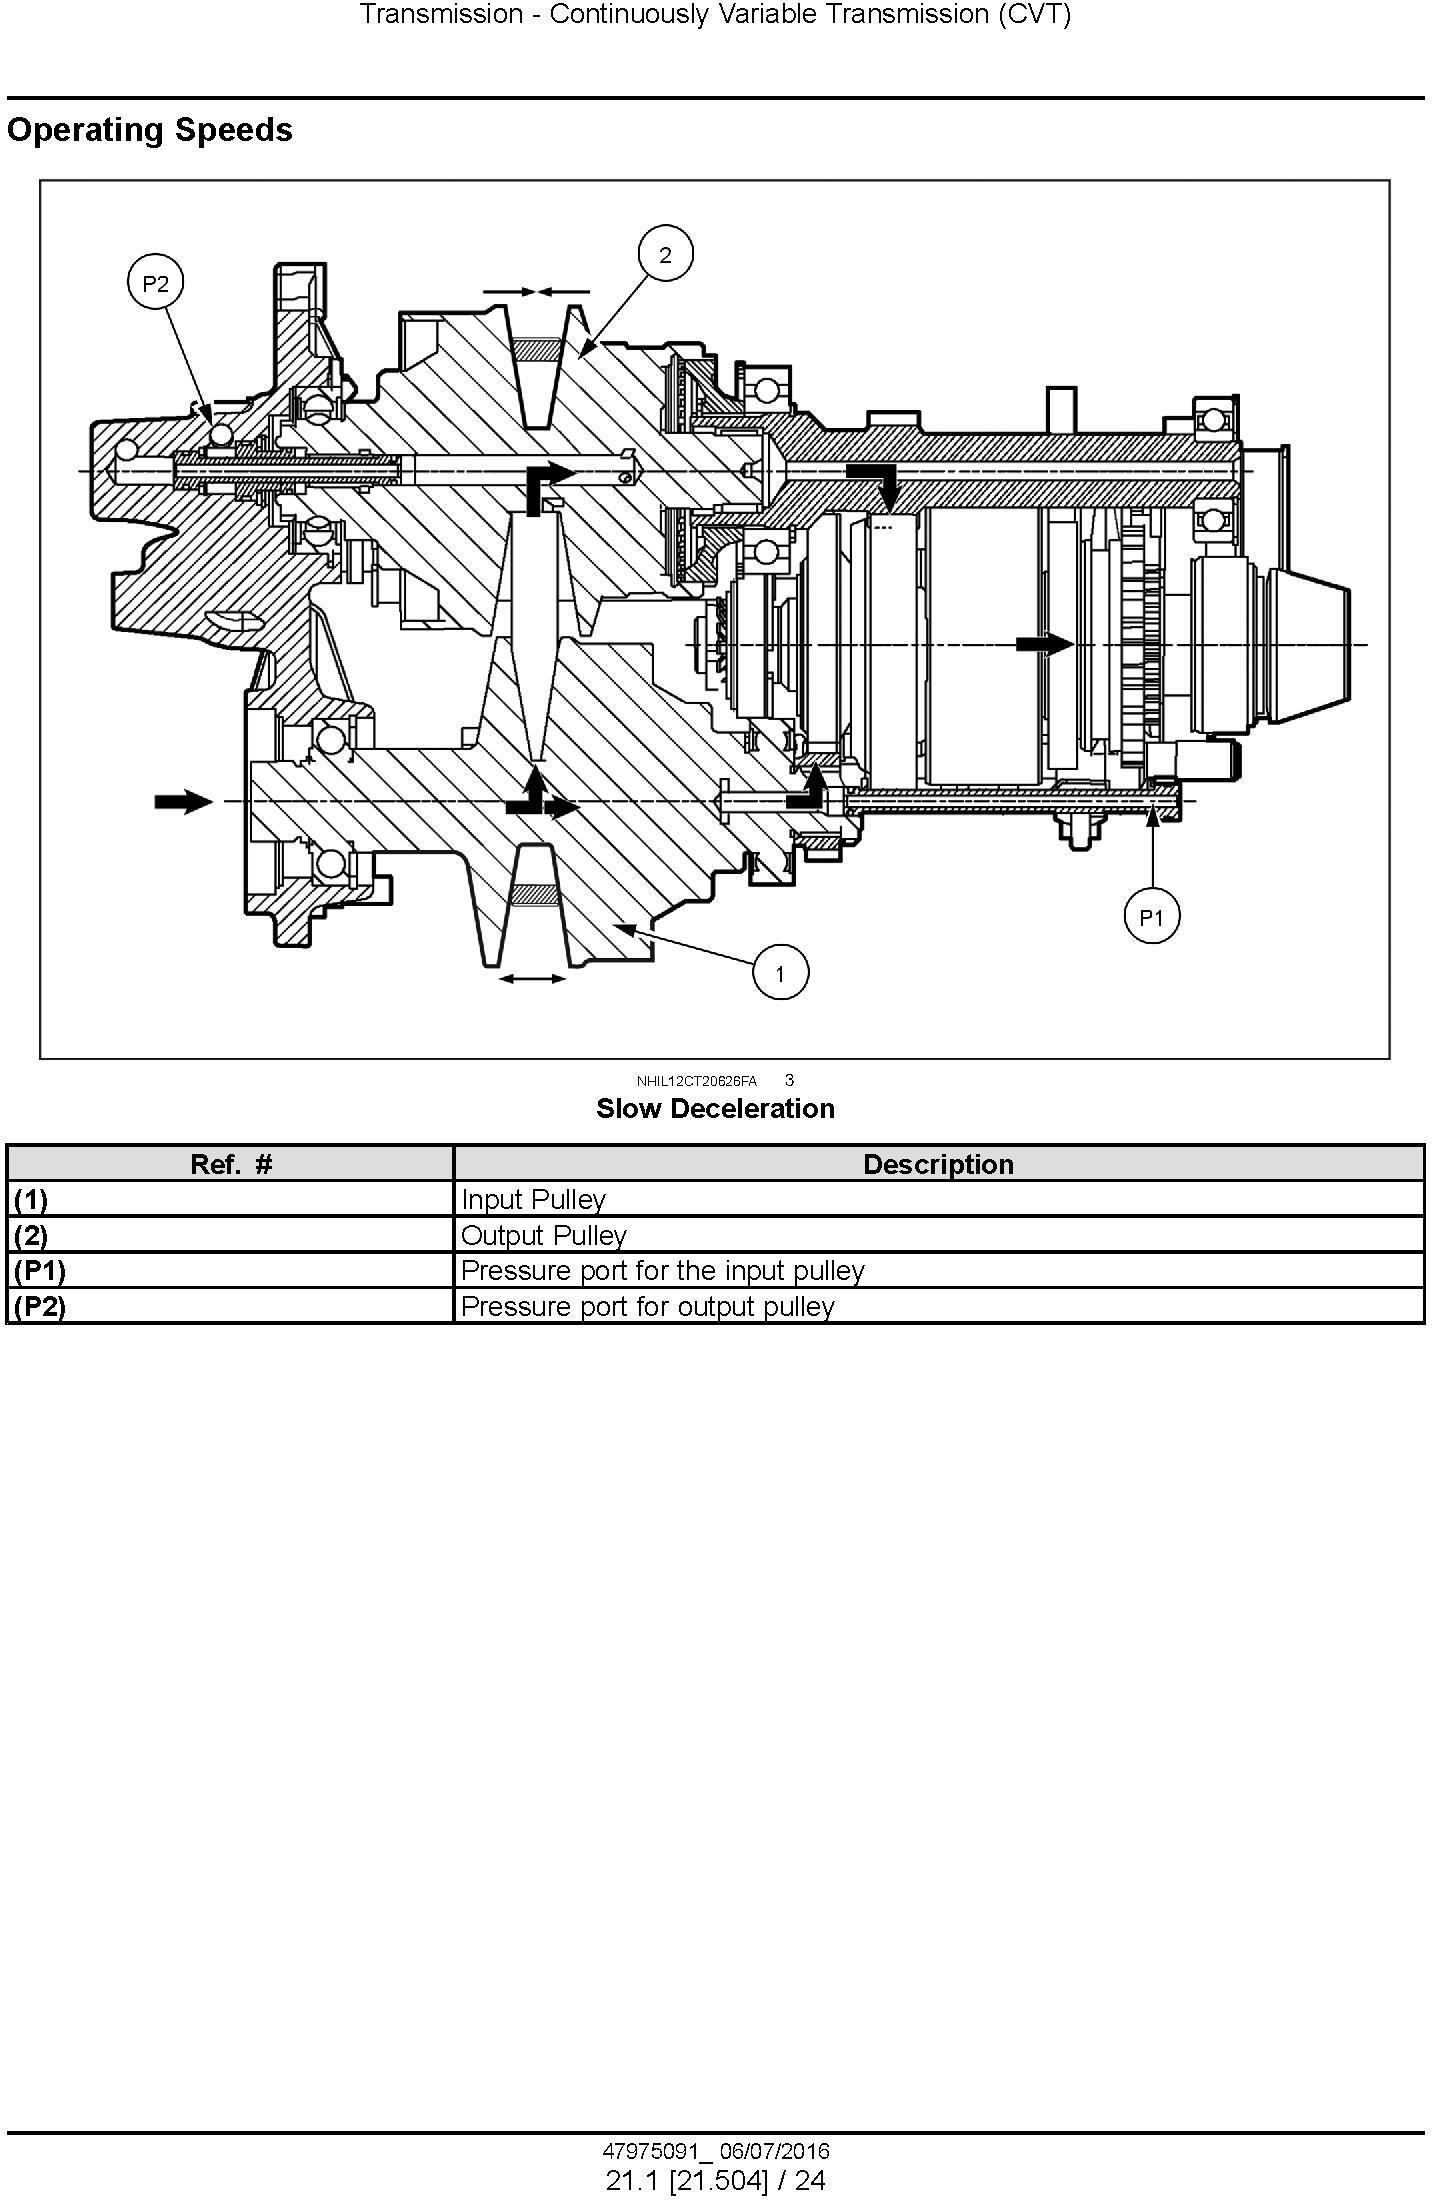 New Holland Boomer 40D CVT, 45D CVT, 50D CVT Tier 3 Compact Tractor Complete Service Manual - 1